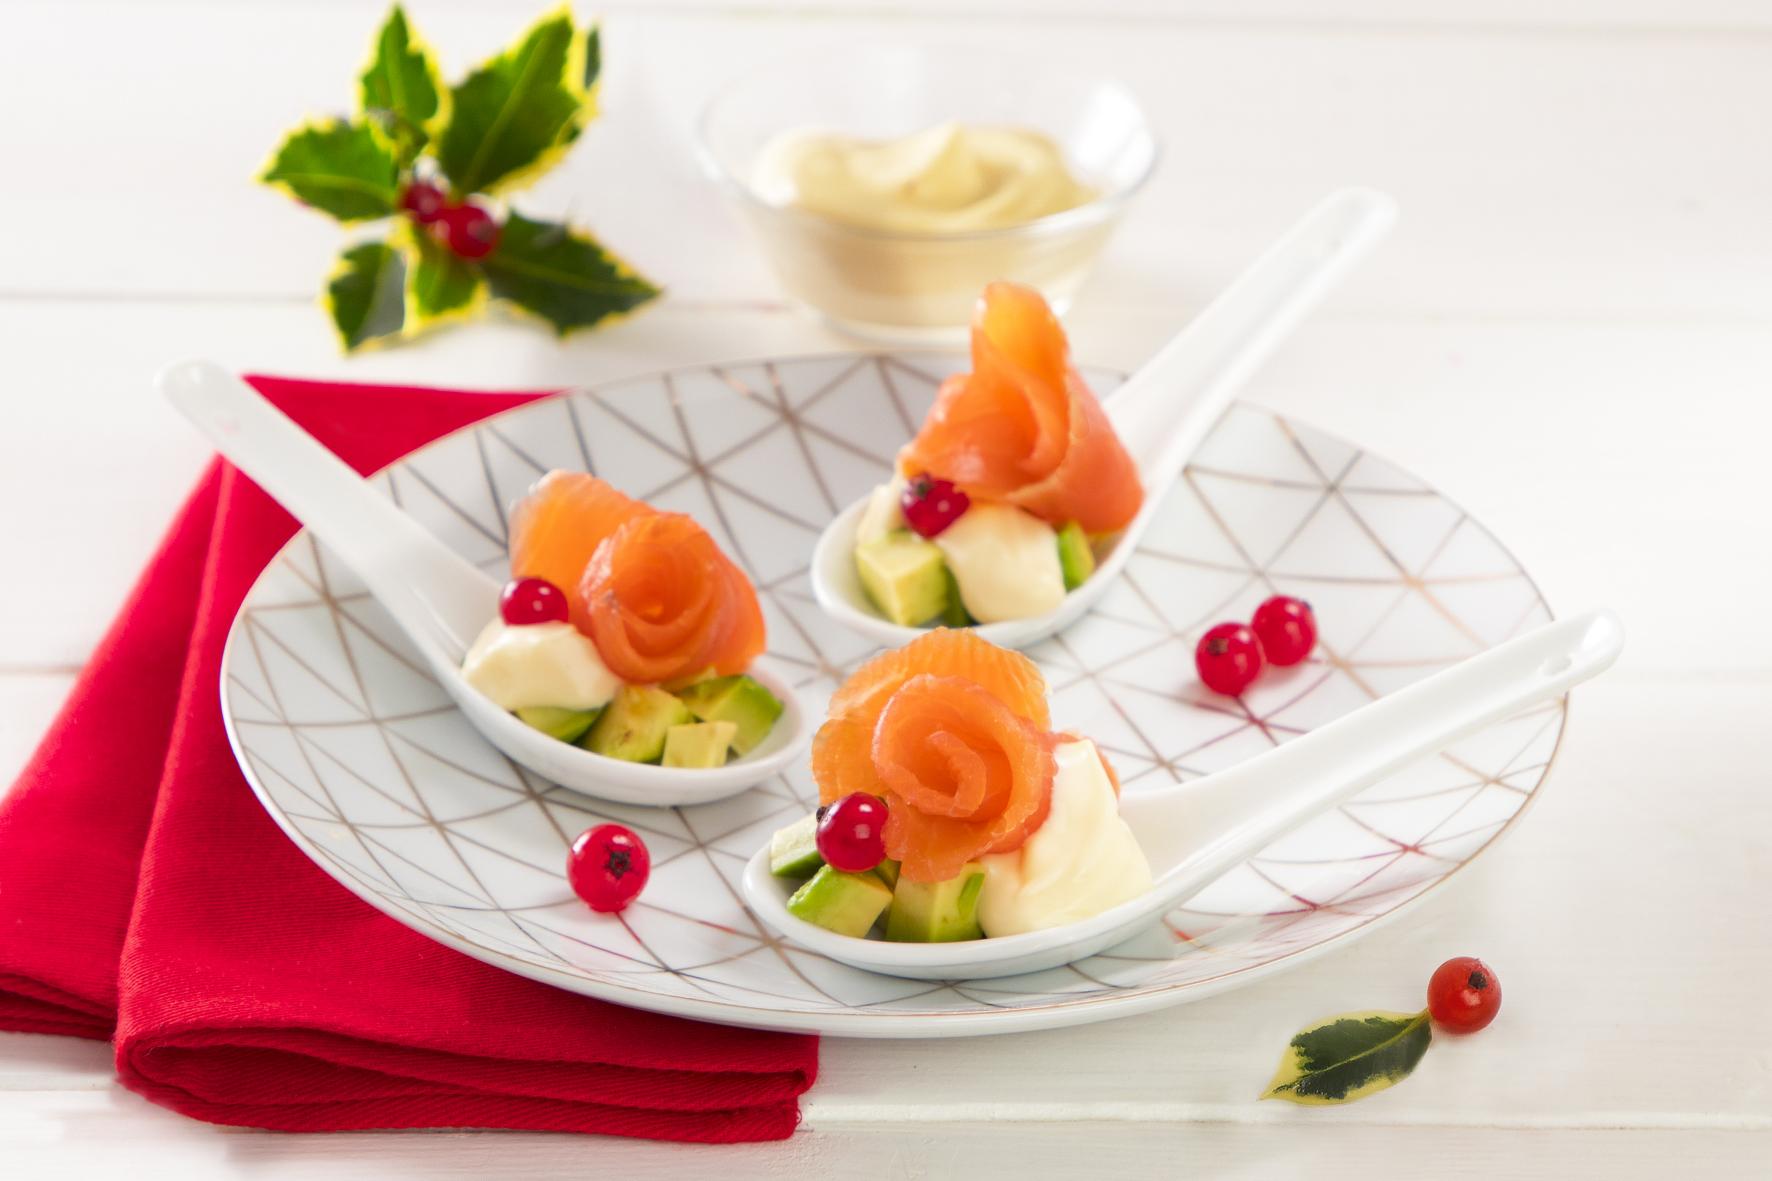 Finger food di salmone, maionese e avocado